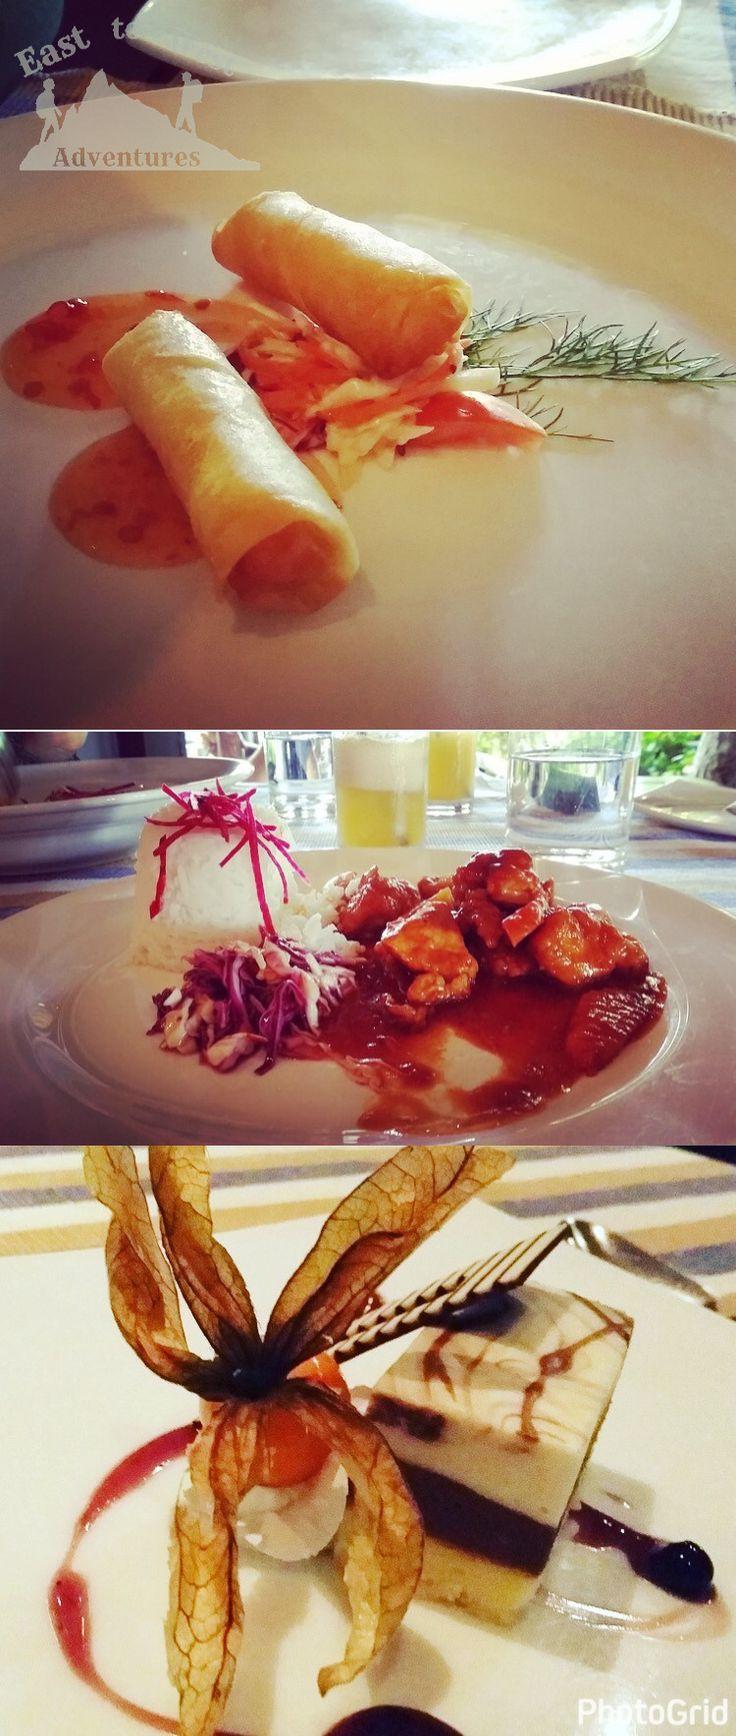 5 star meal in the Maldives 😍 وجبة خمسة نجوم في المالديف    #easttowestadventures #maldives #travelblogger #travelphotography  To know more about our trip to the Maldives check the blog لمعرفة المزيد عن رحلتنا إلى جزر المالديف يمكنك قراءة المدونة على الرابط http://www.easttowestadventures.com/en/